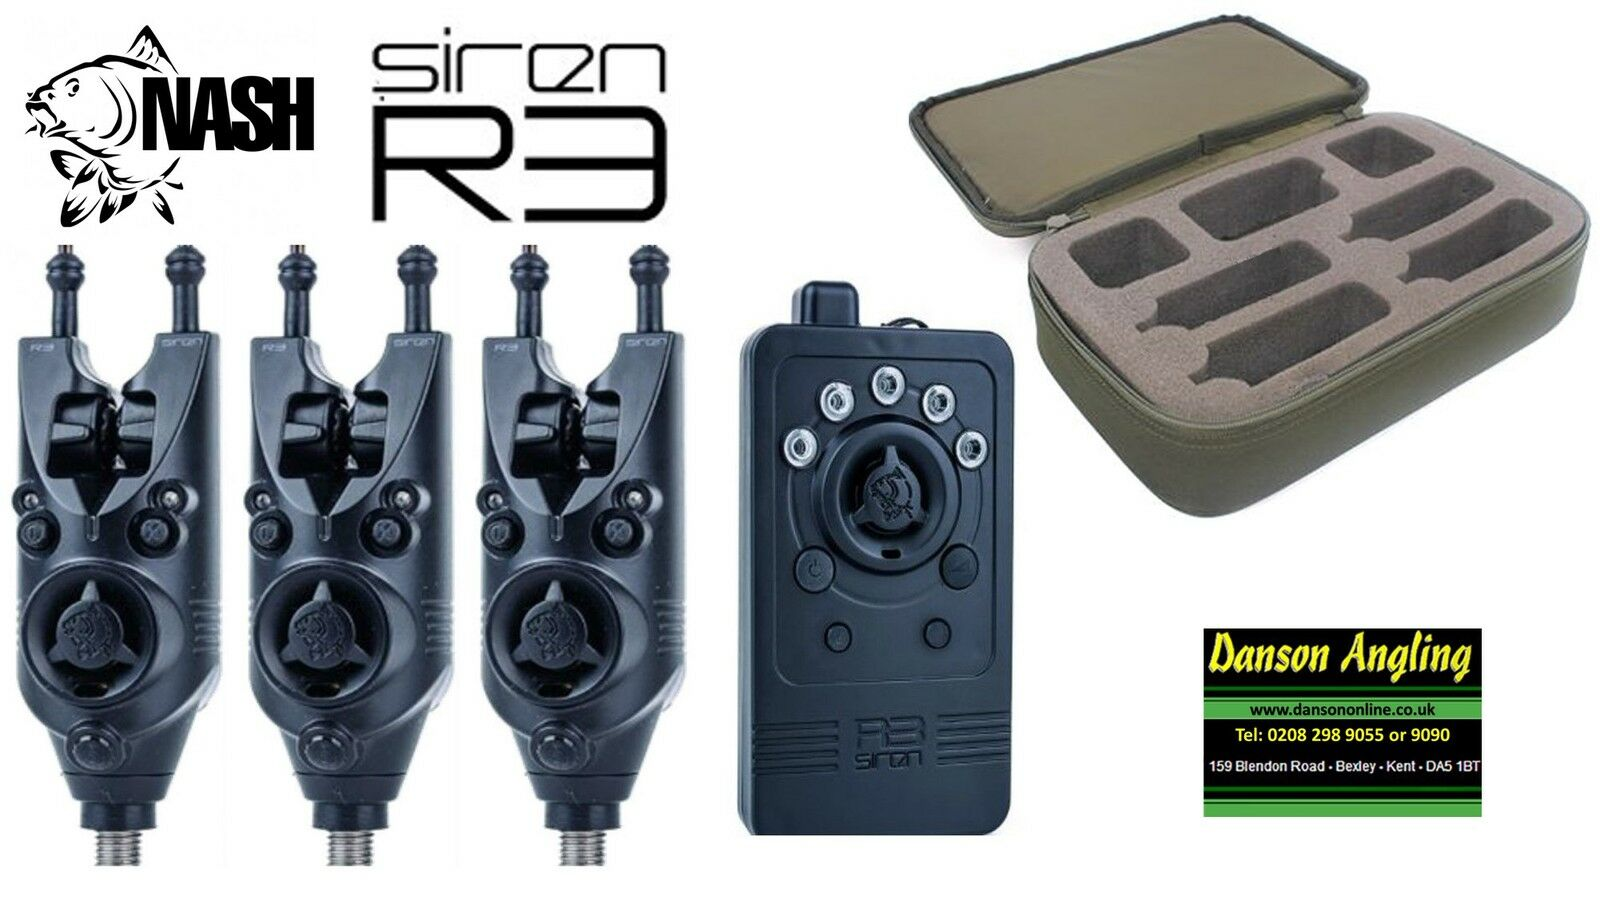 3 x Nash Siren R3 Remote Alarms & Receiver + Presentation Case All Colours